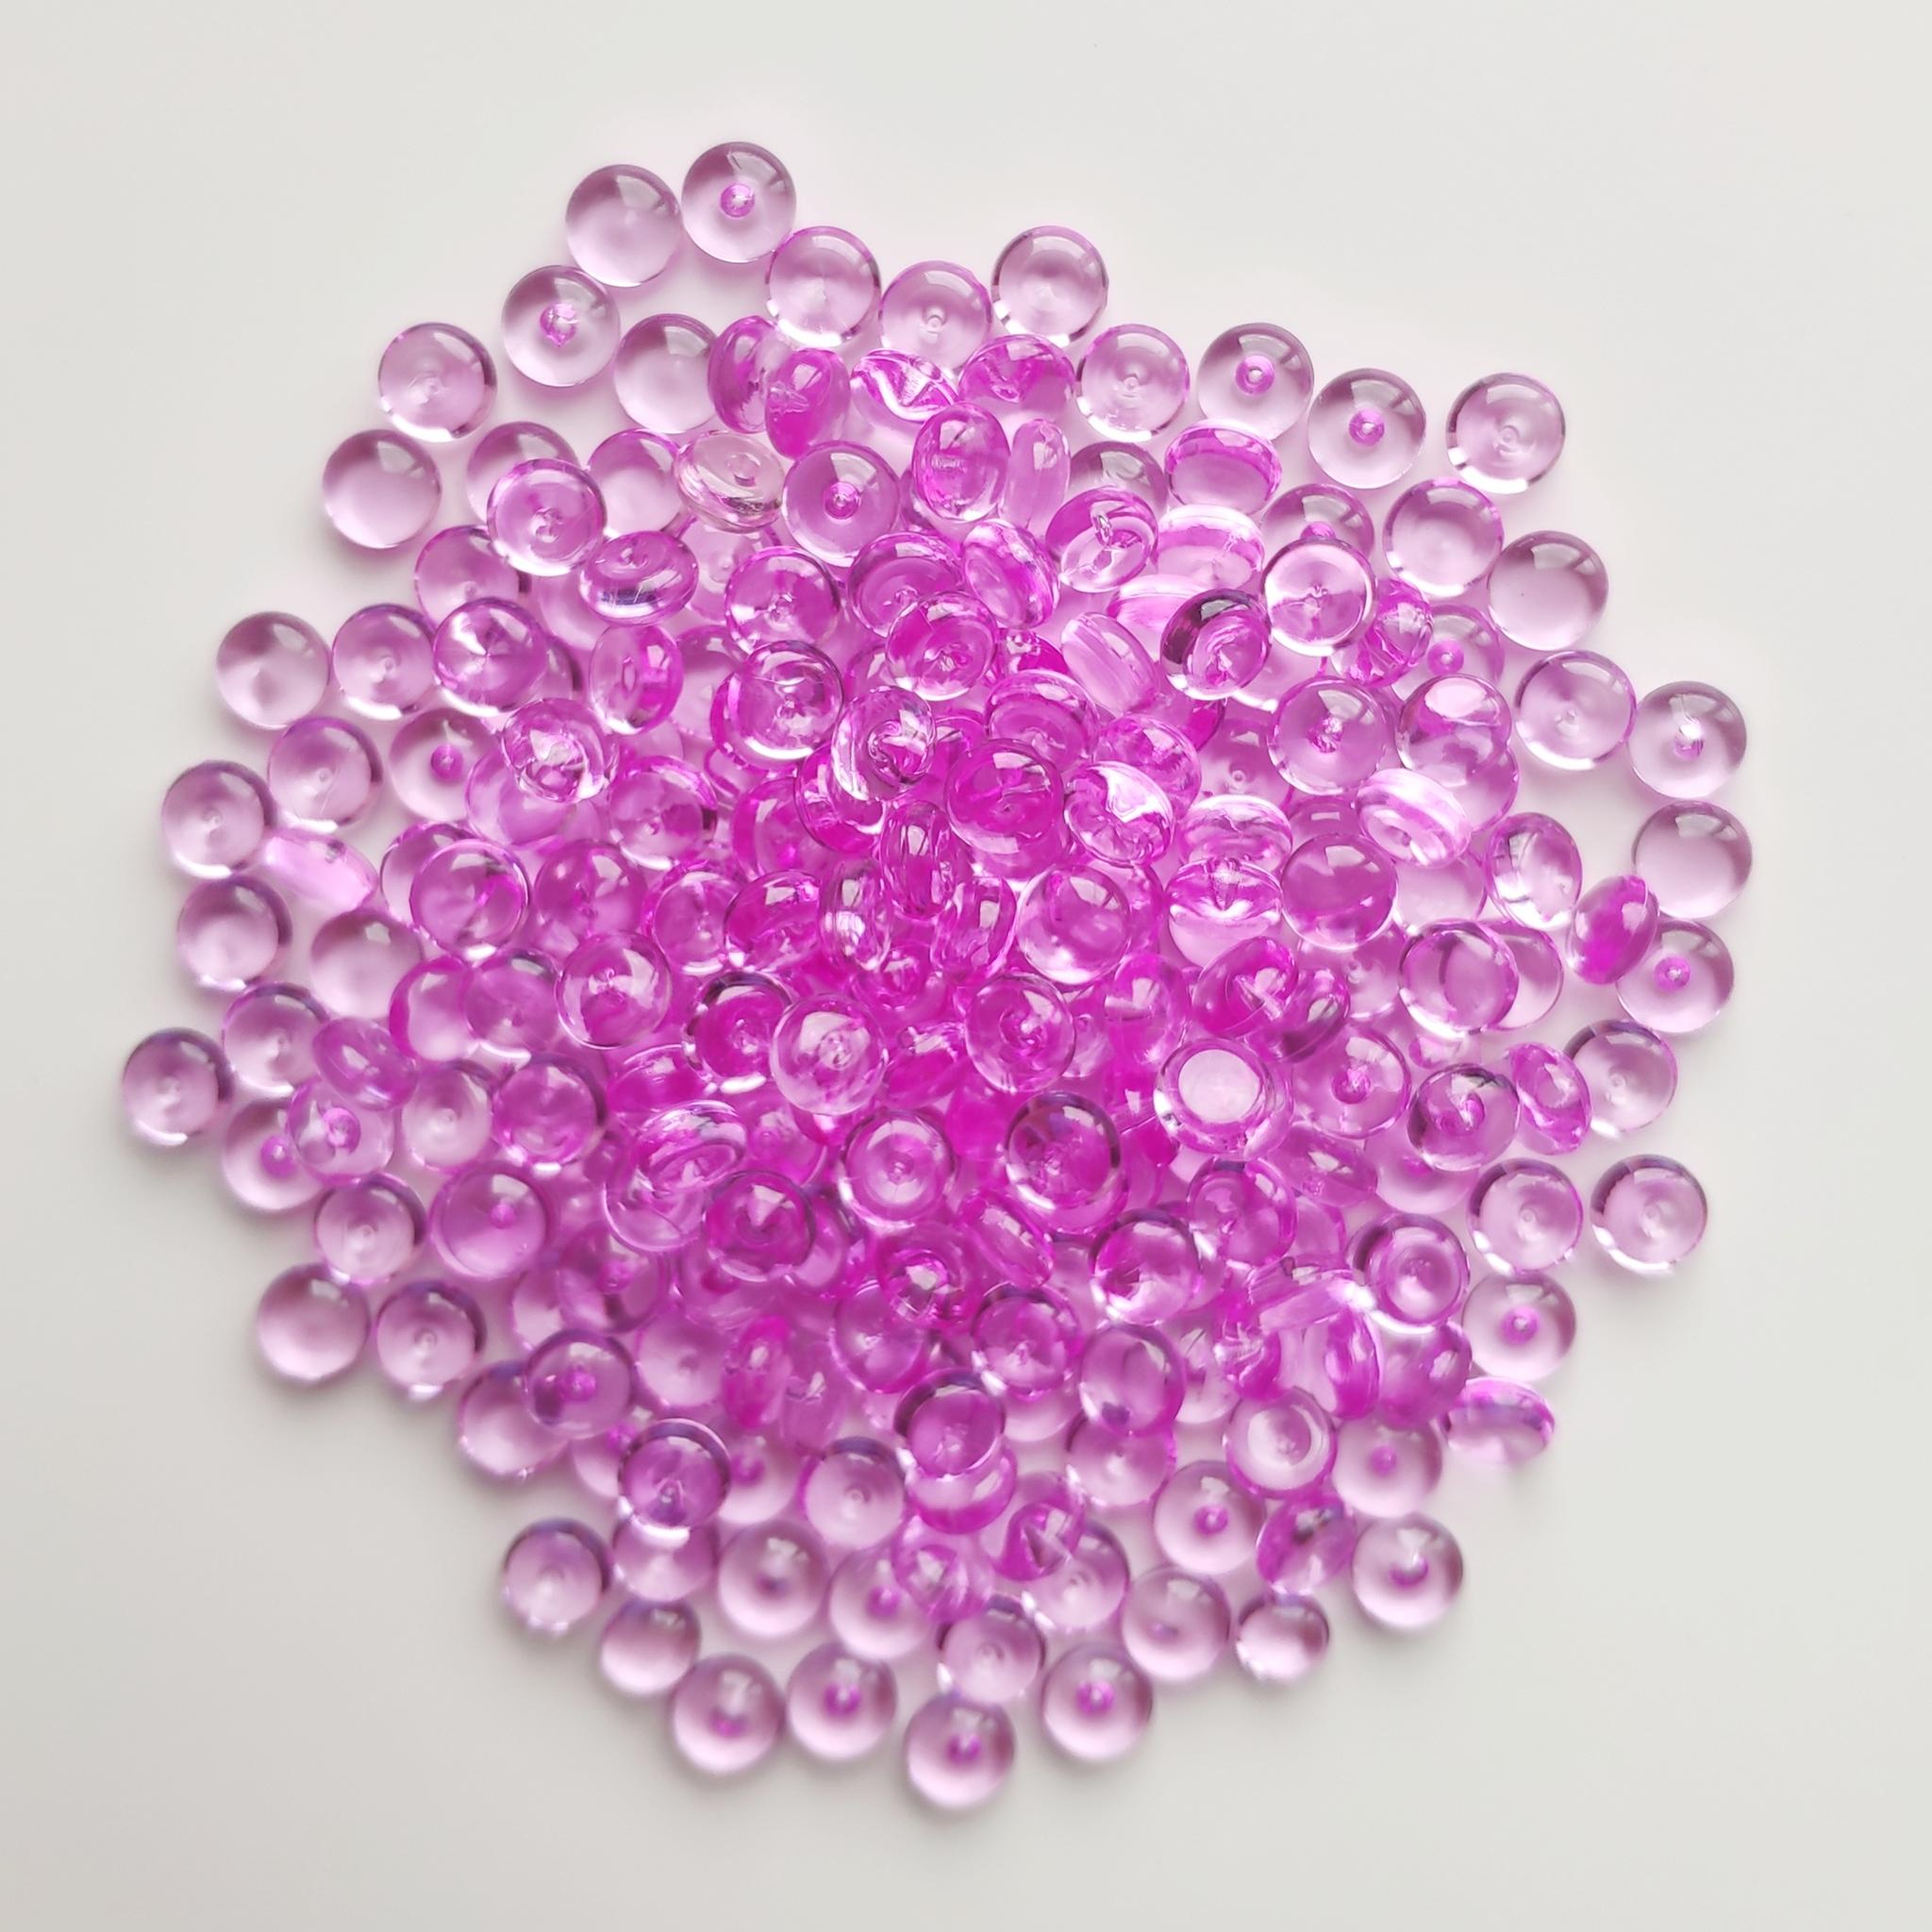 Фишболы для слайма гранулят фиолетовый